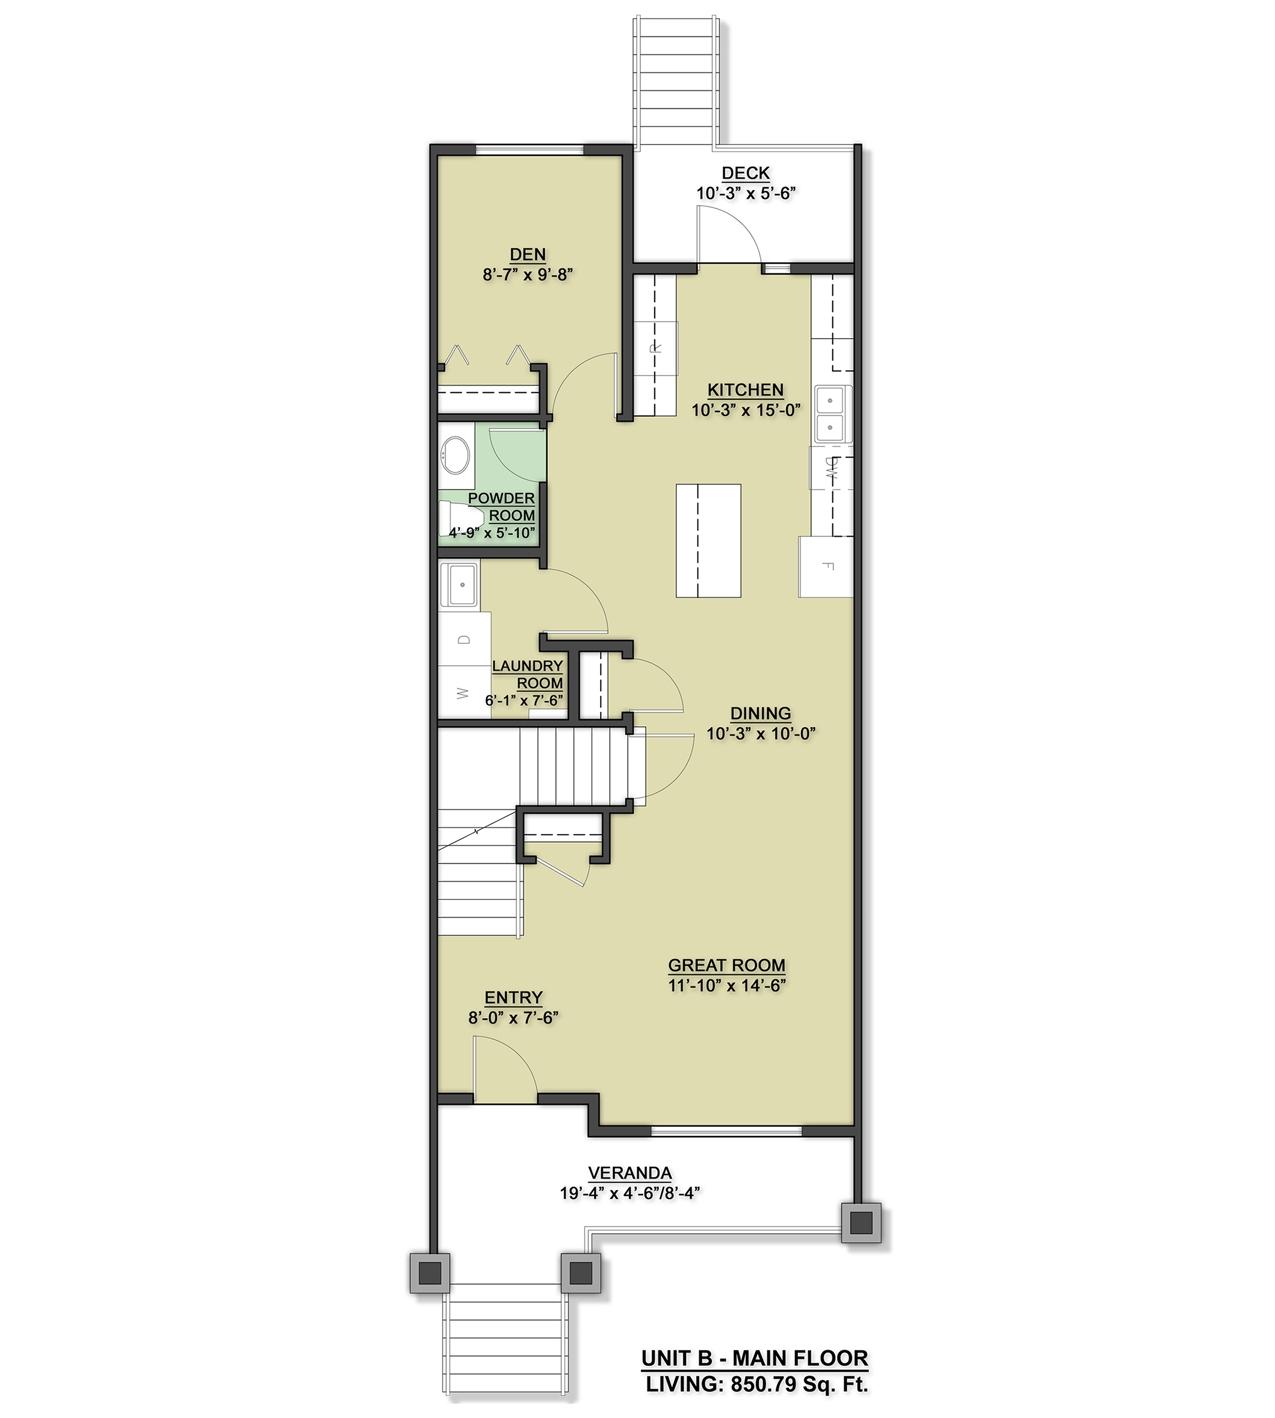 Row Home Main Floor Design Unit B